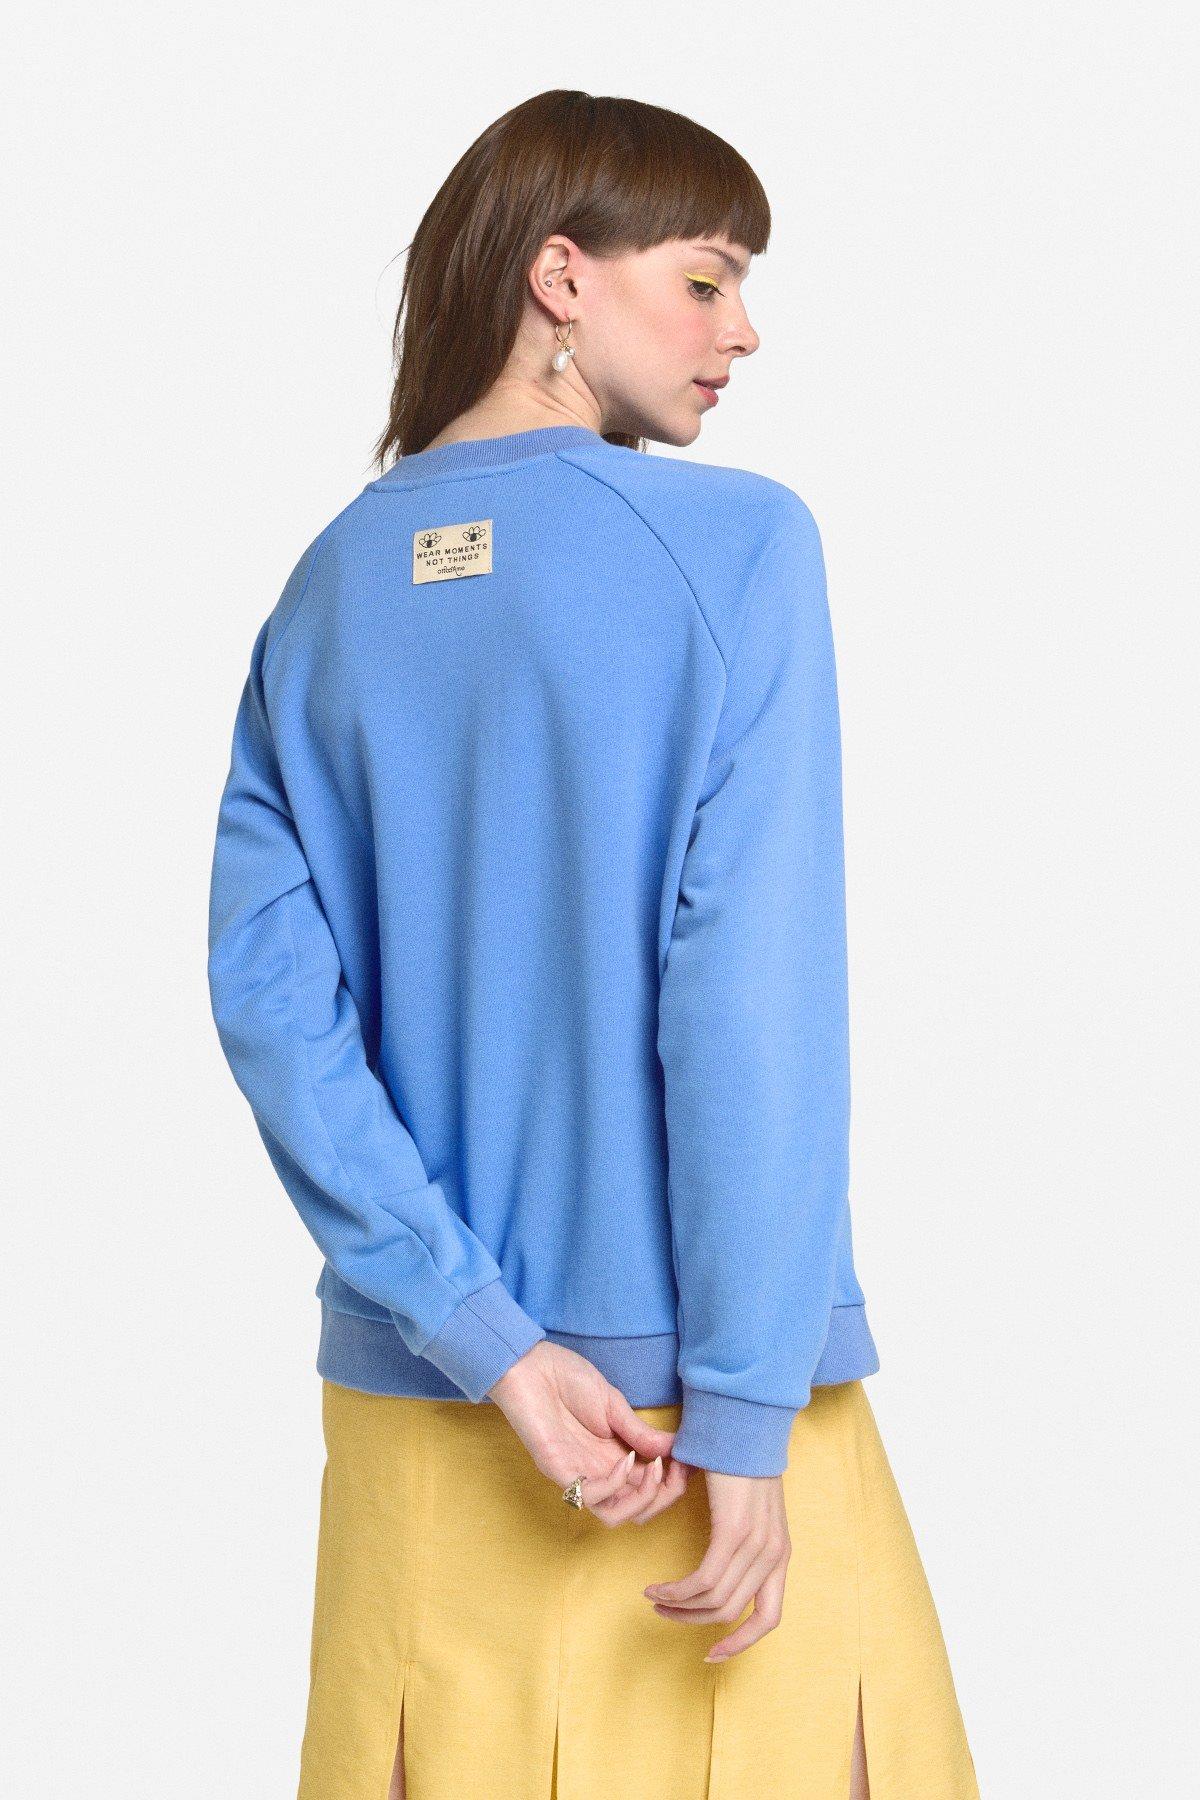 Sweatshirt with printing